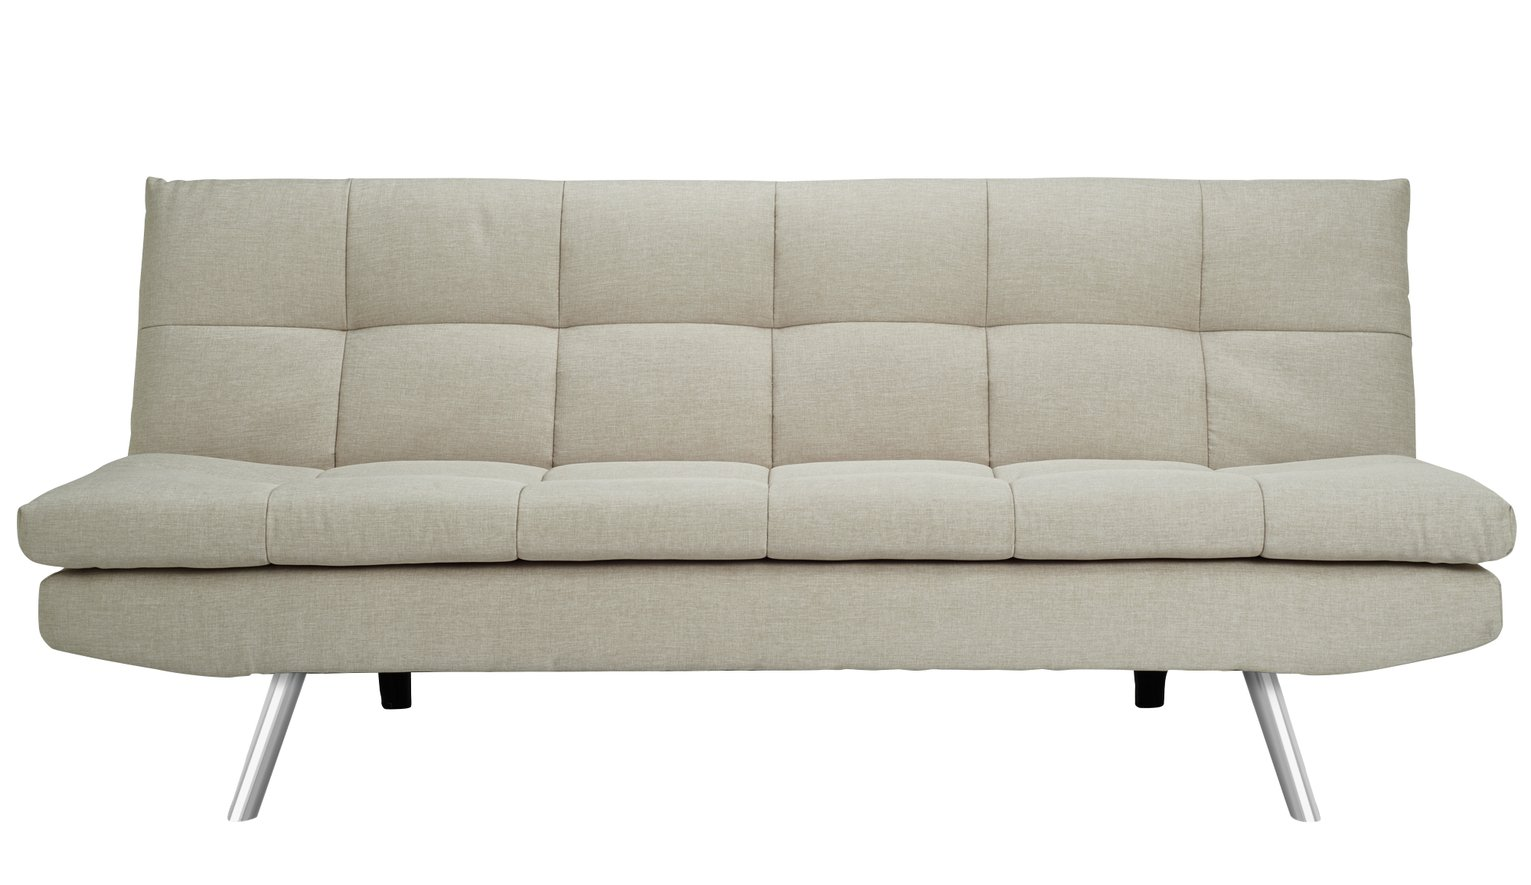 Buy Argos Home Nolan 3 Seater Fabric Sofa Bed - Natural | Sofa beds